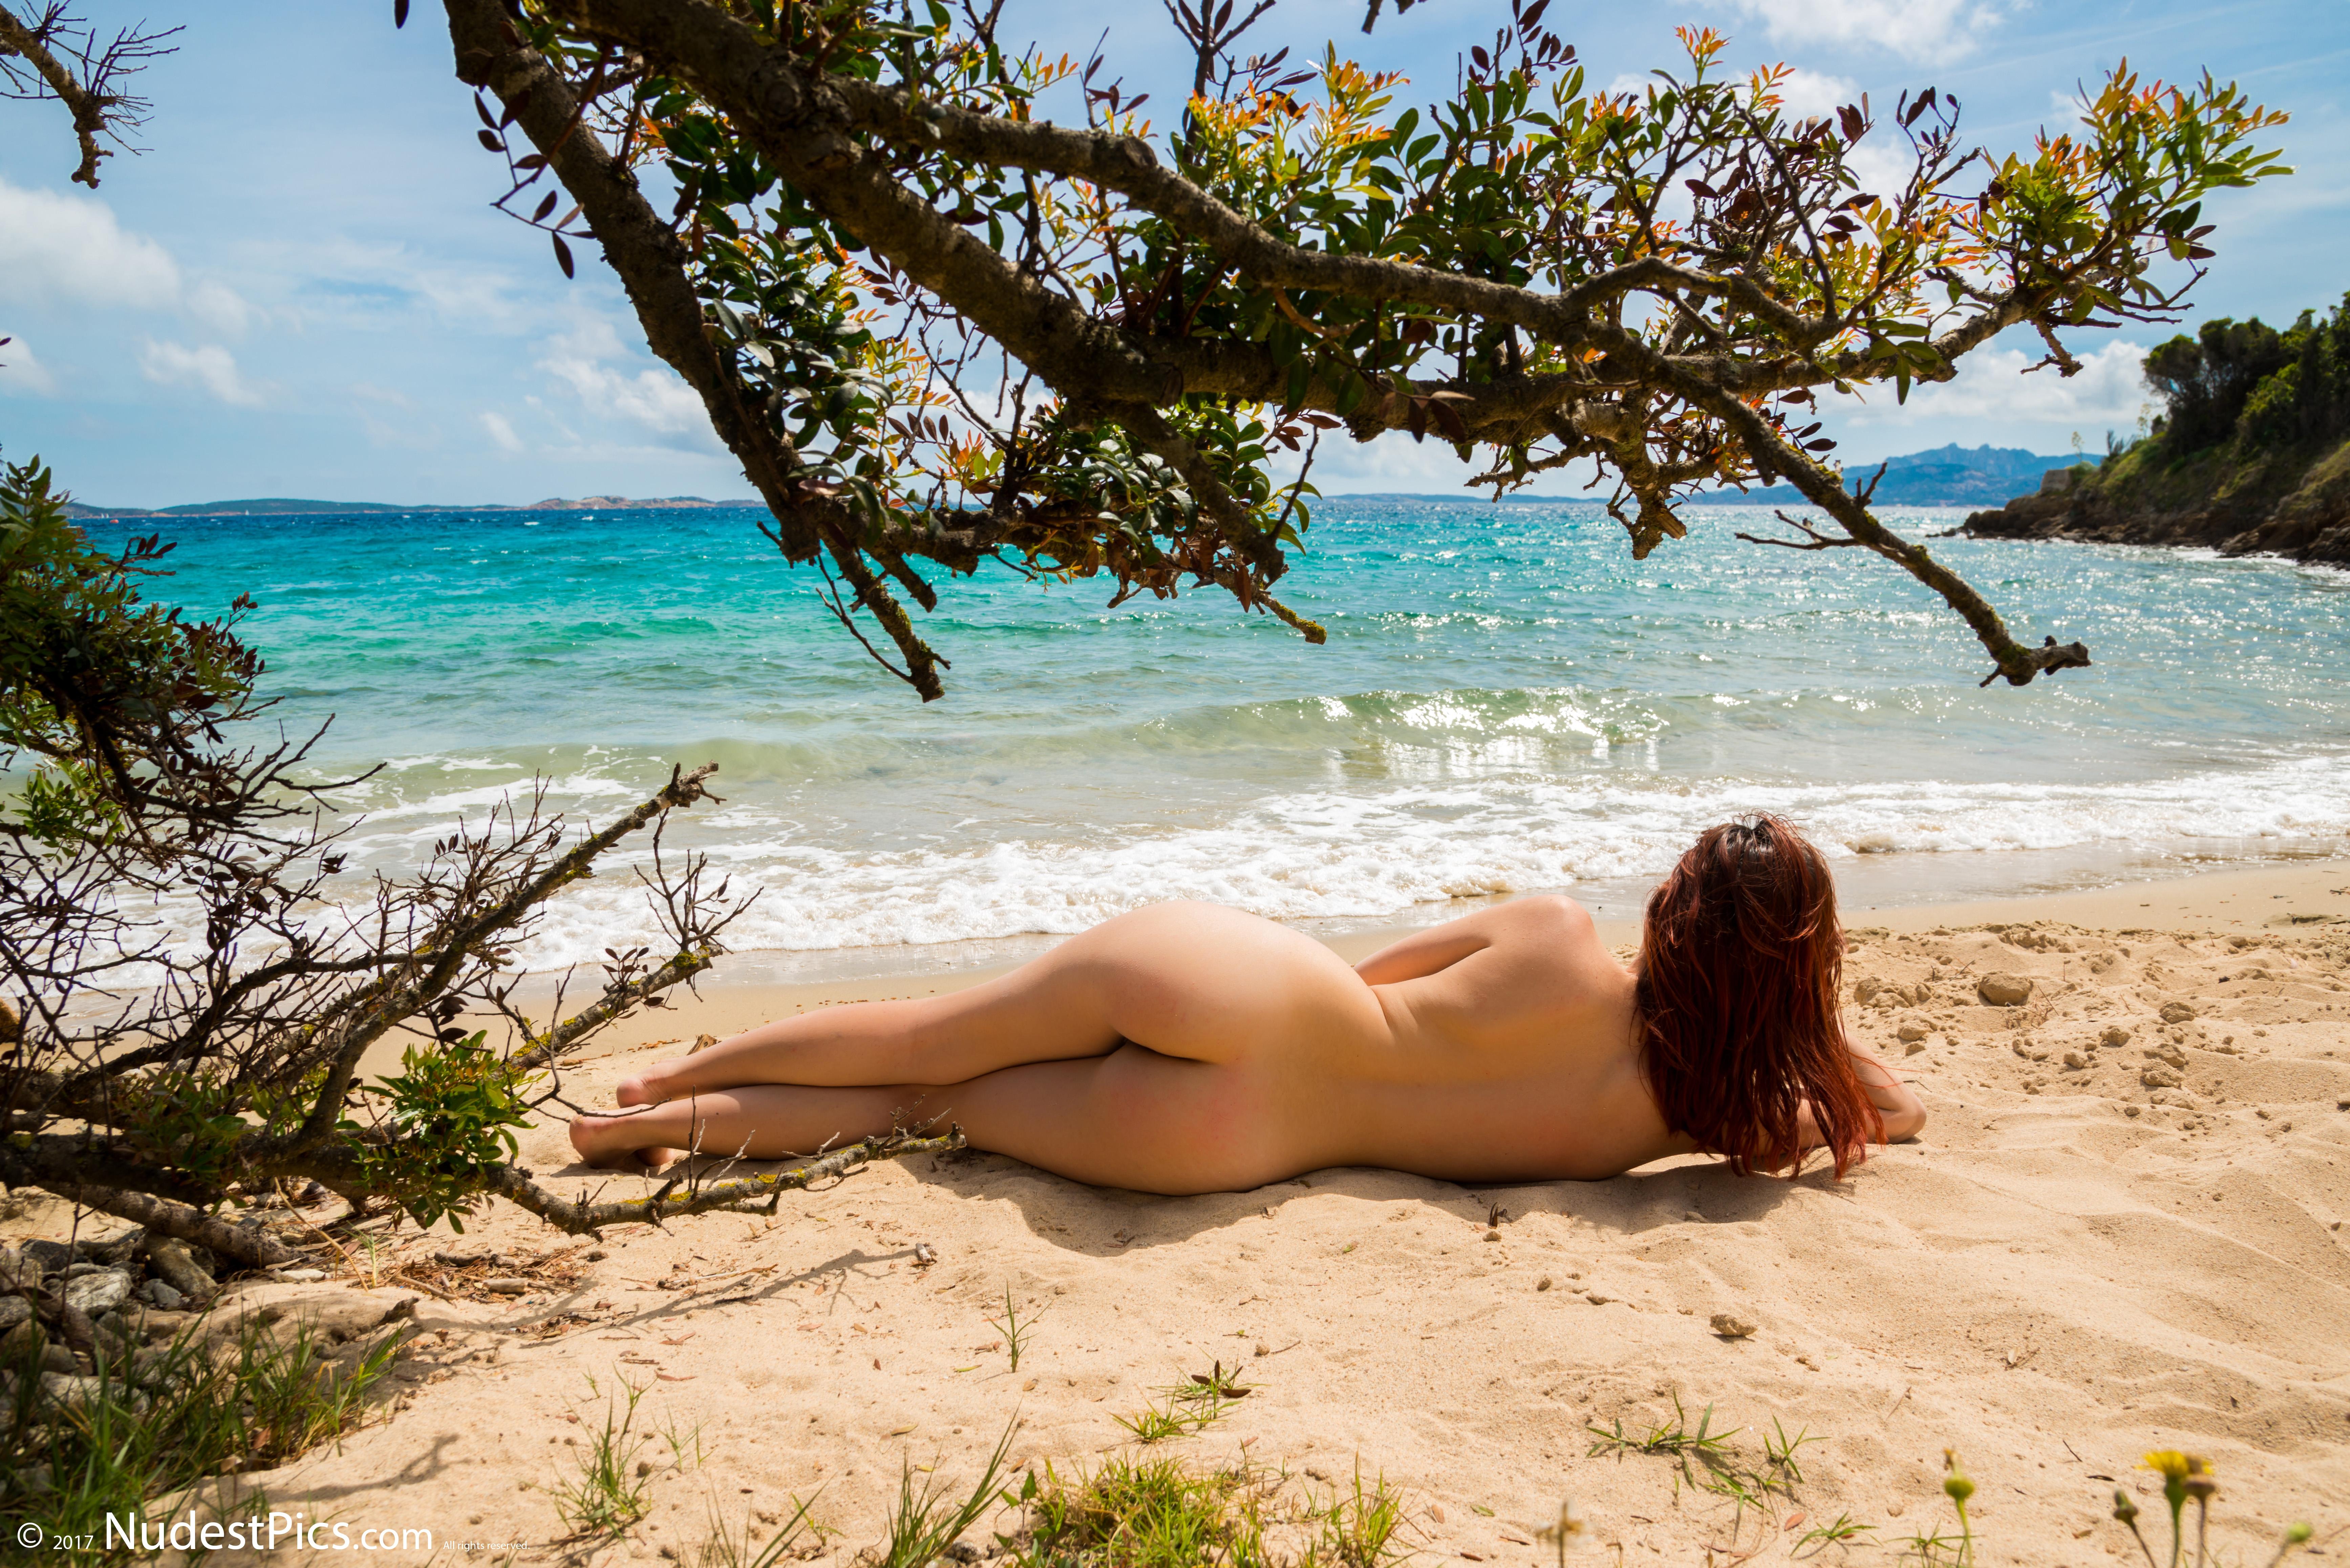 Woman Sunbathing on Nudist Beach